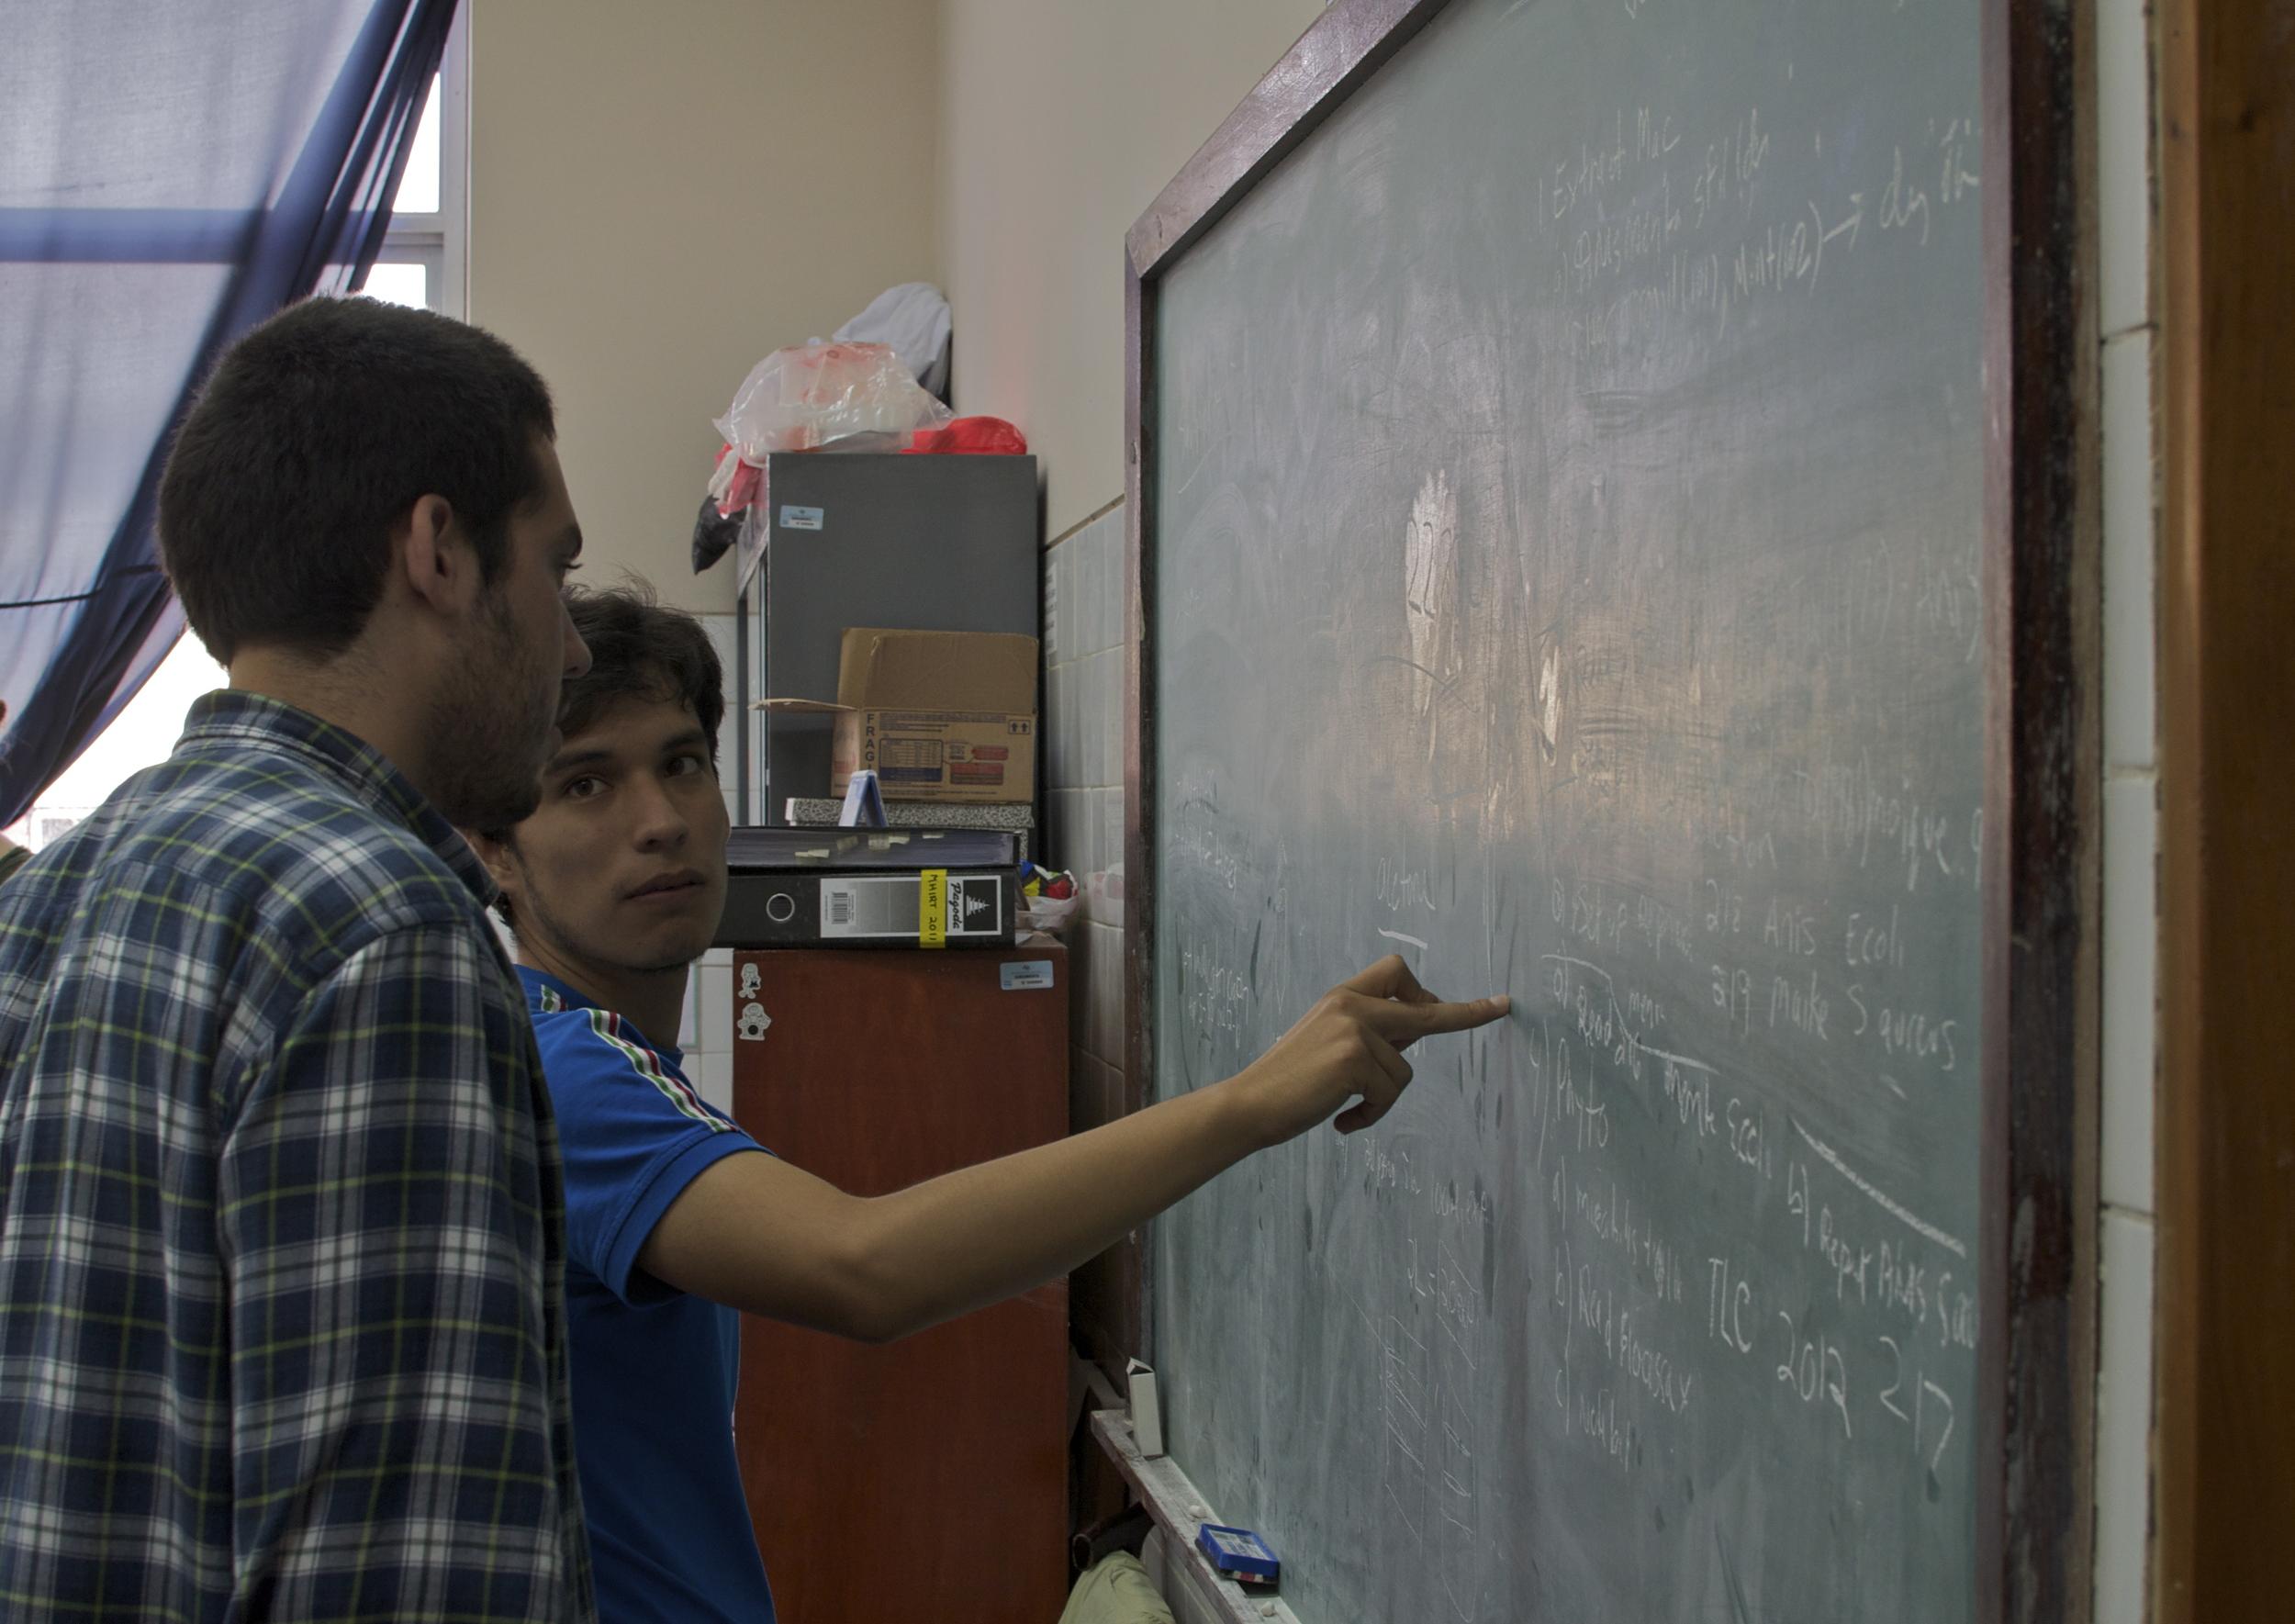 June 2014 - Alejandro Irtube aids MHIRT student Abelardo Arellano theUNT lab.